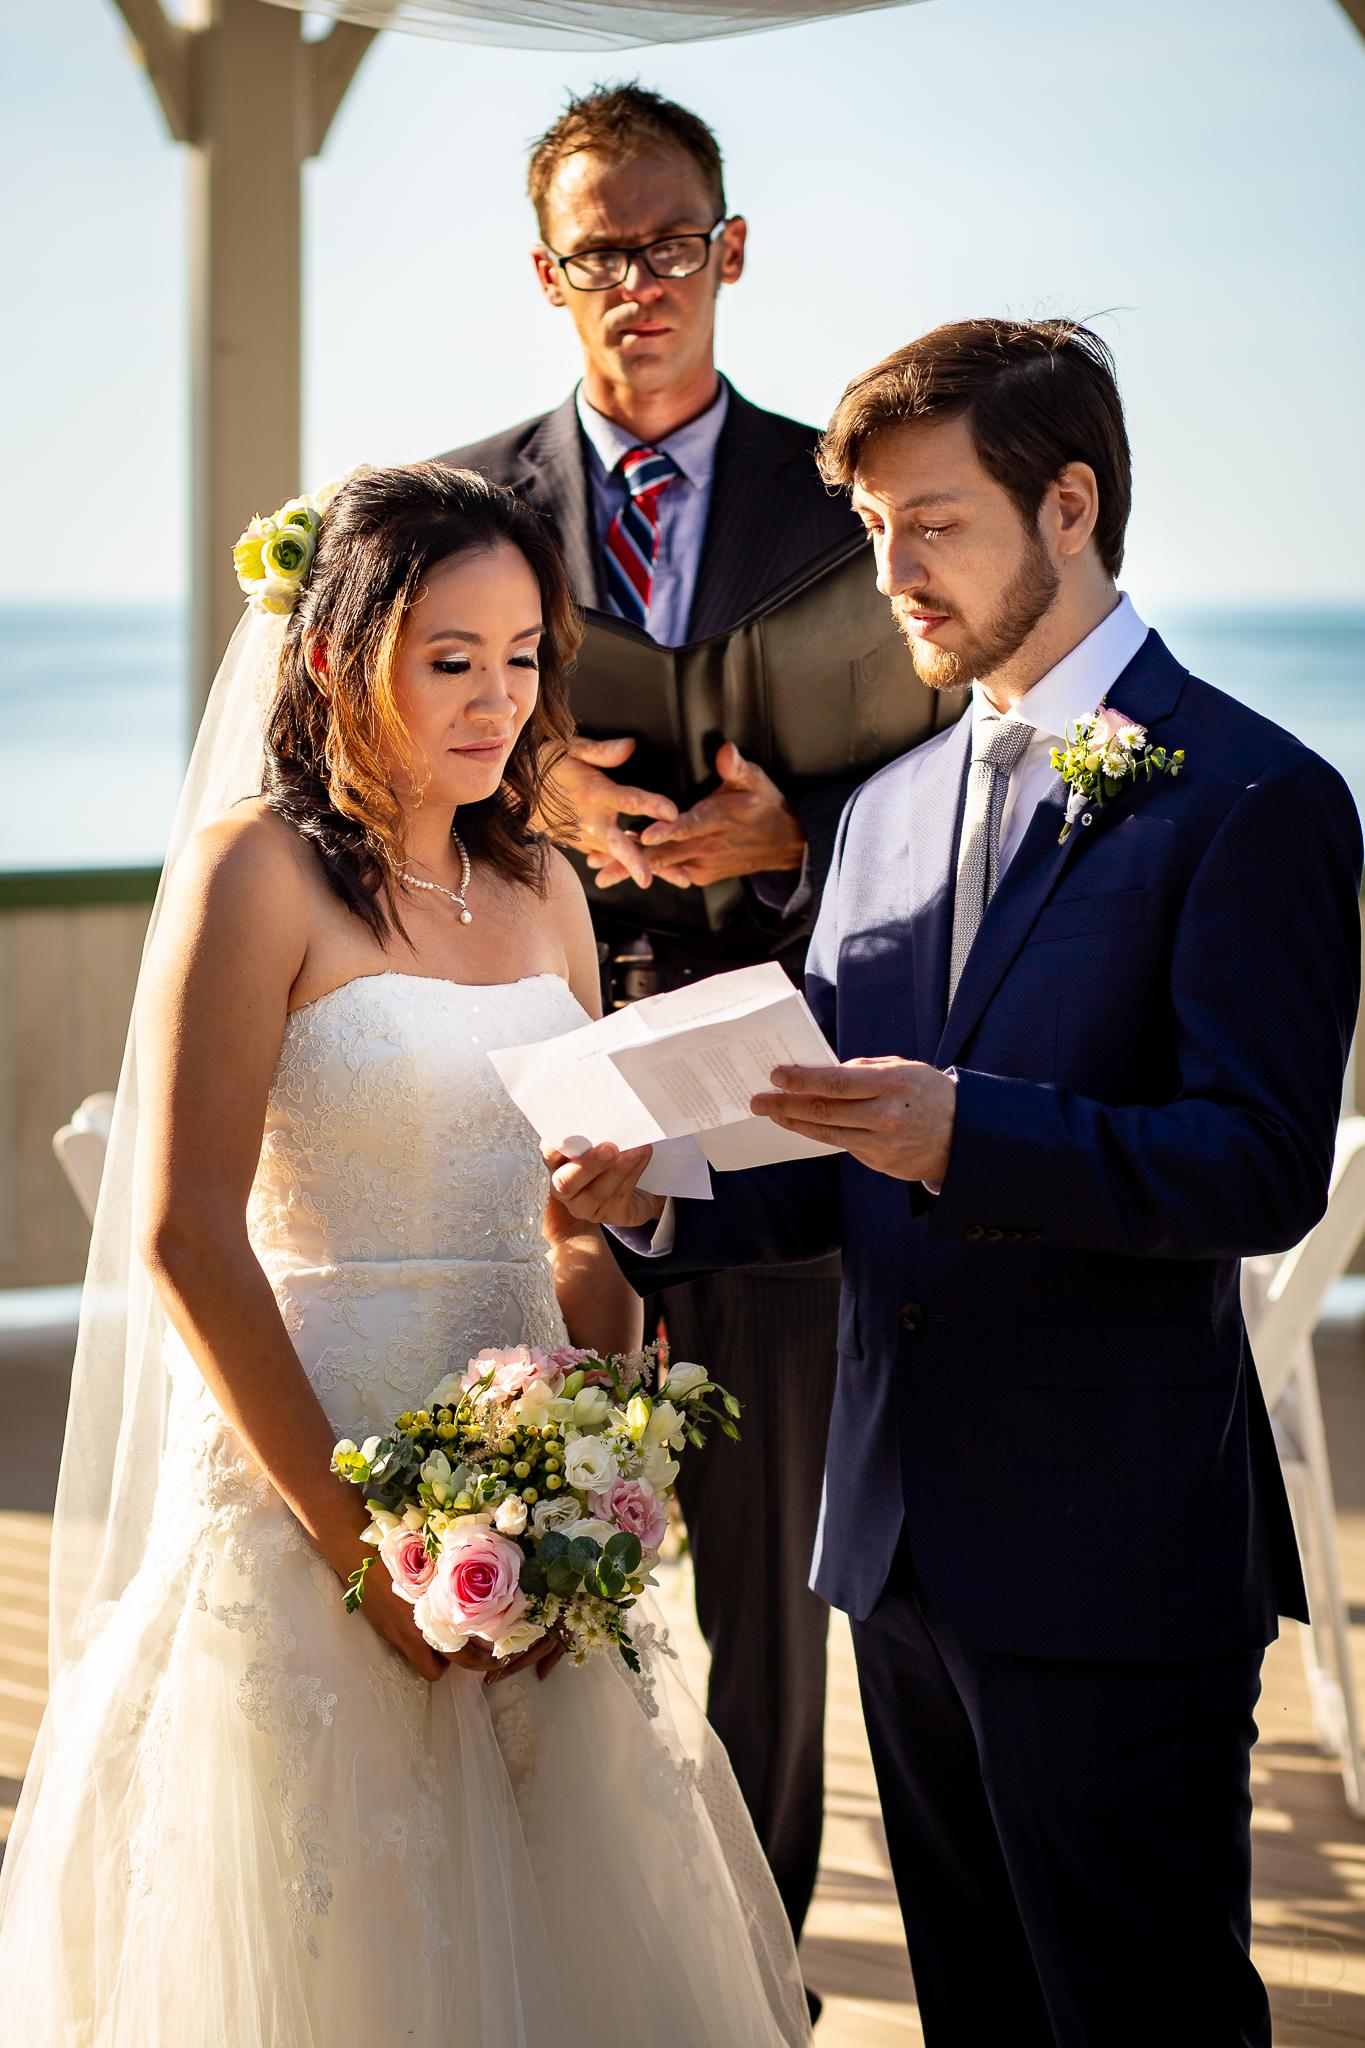 Toronto-wedding-Photograper-38.jpg